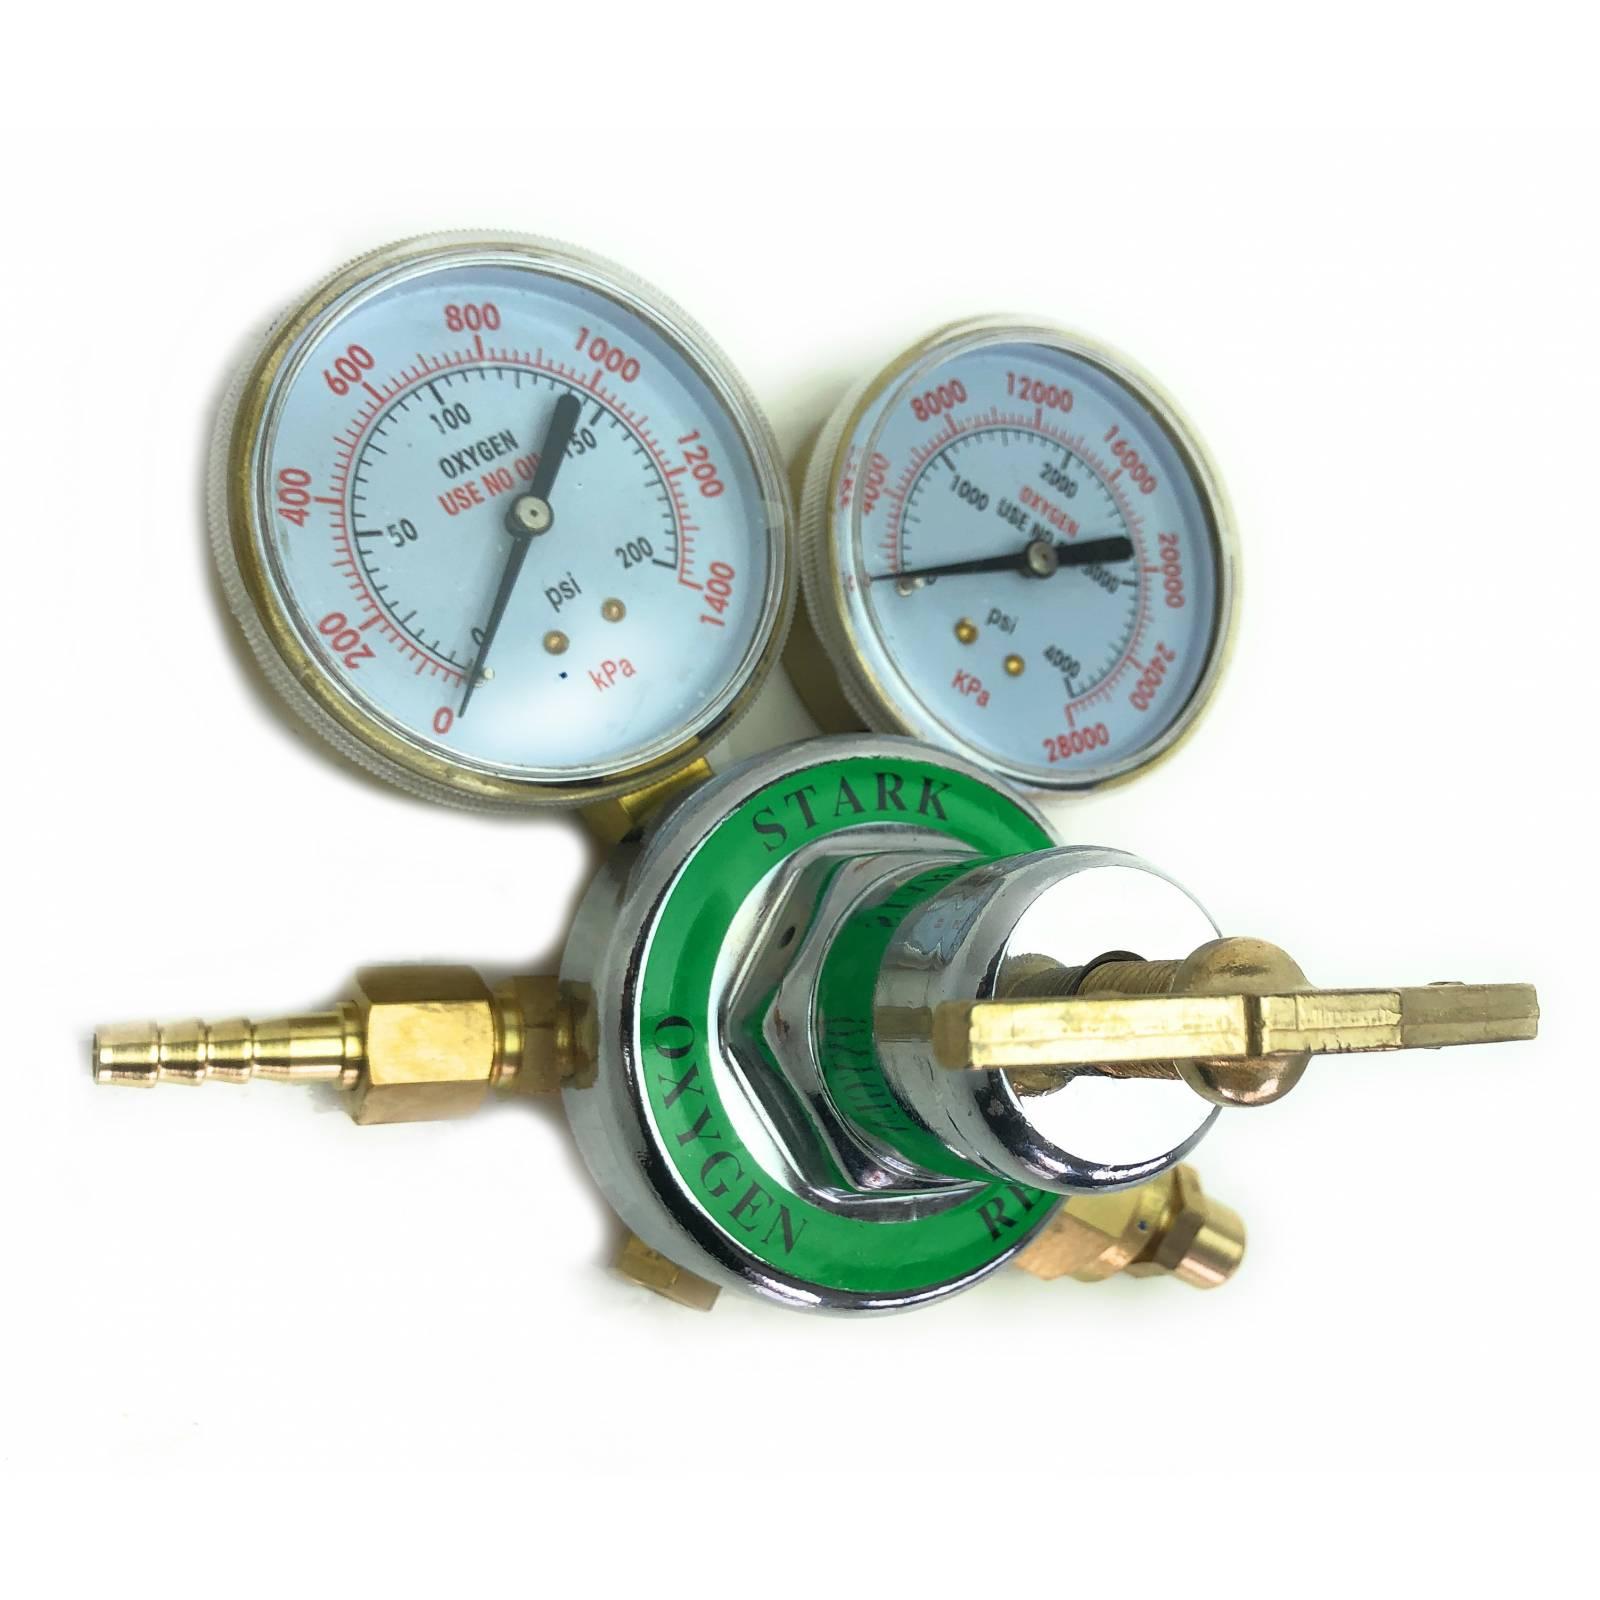 Manometro Regulador Tipo H Oxigeno Cga 540 Stark 55089